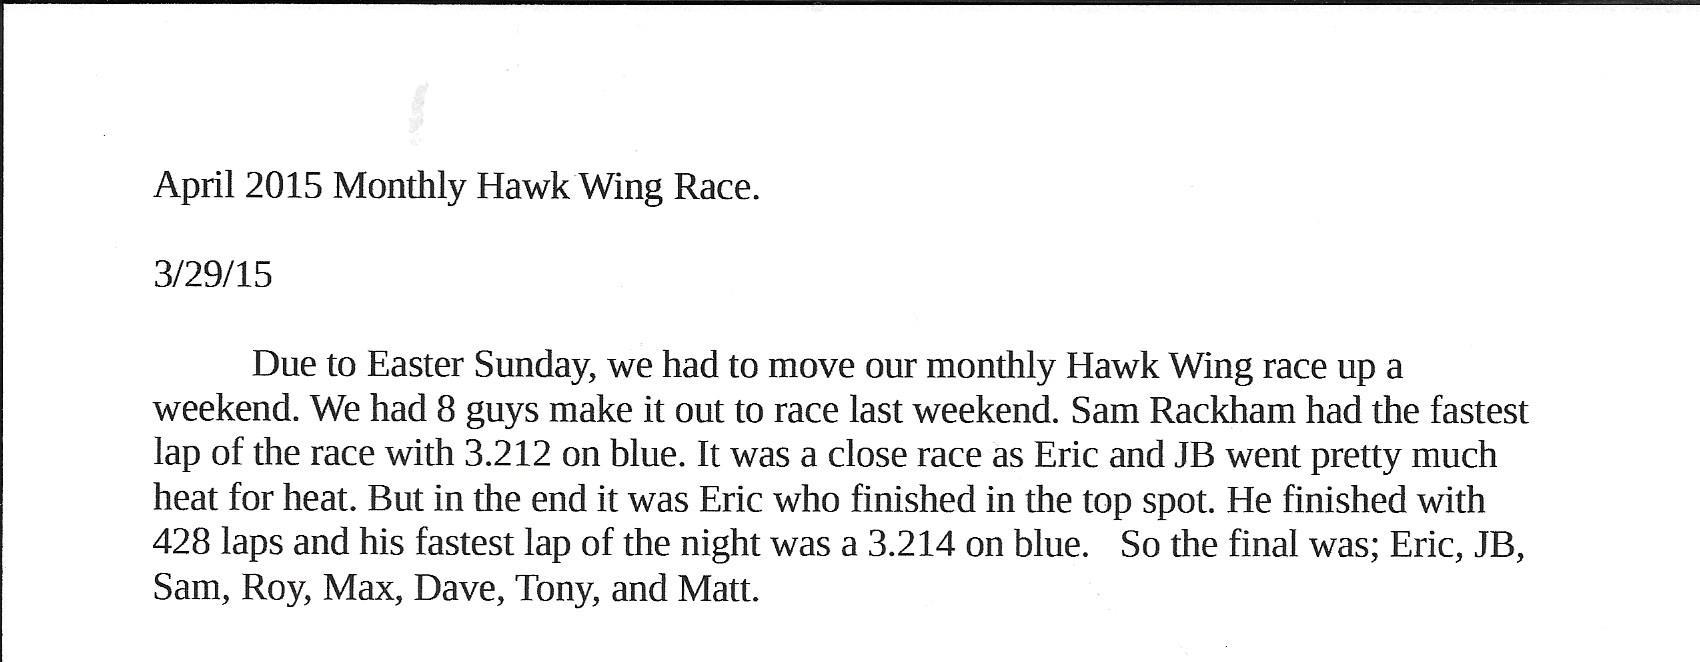 4115 wing race results reprint.jpg